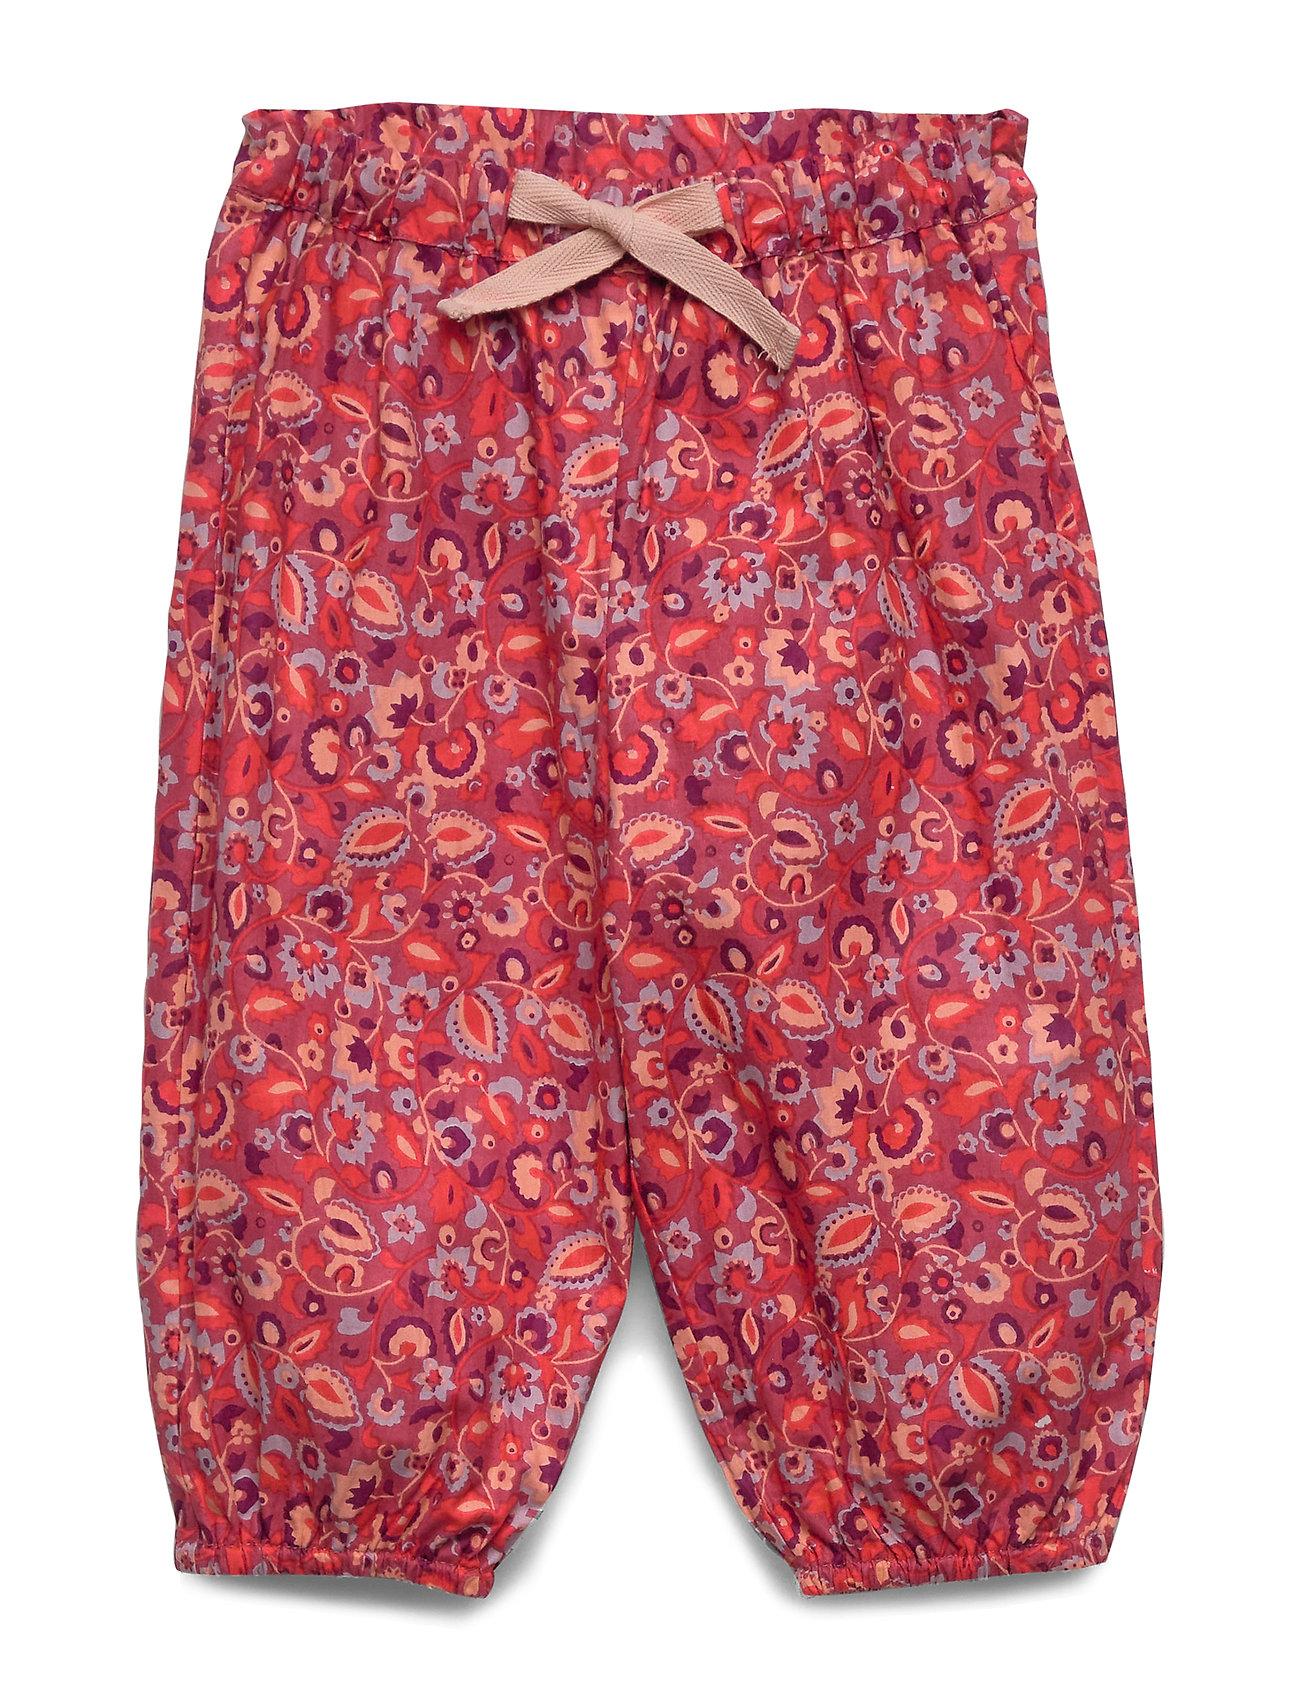 Noa Noa Miniature Trousers - BAROQUE ROSE